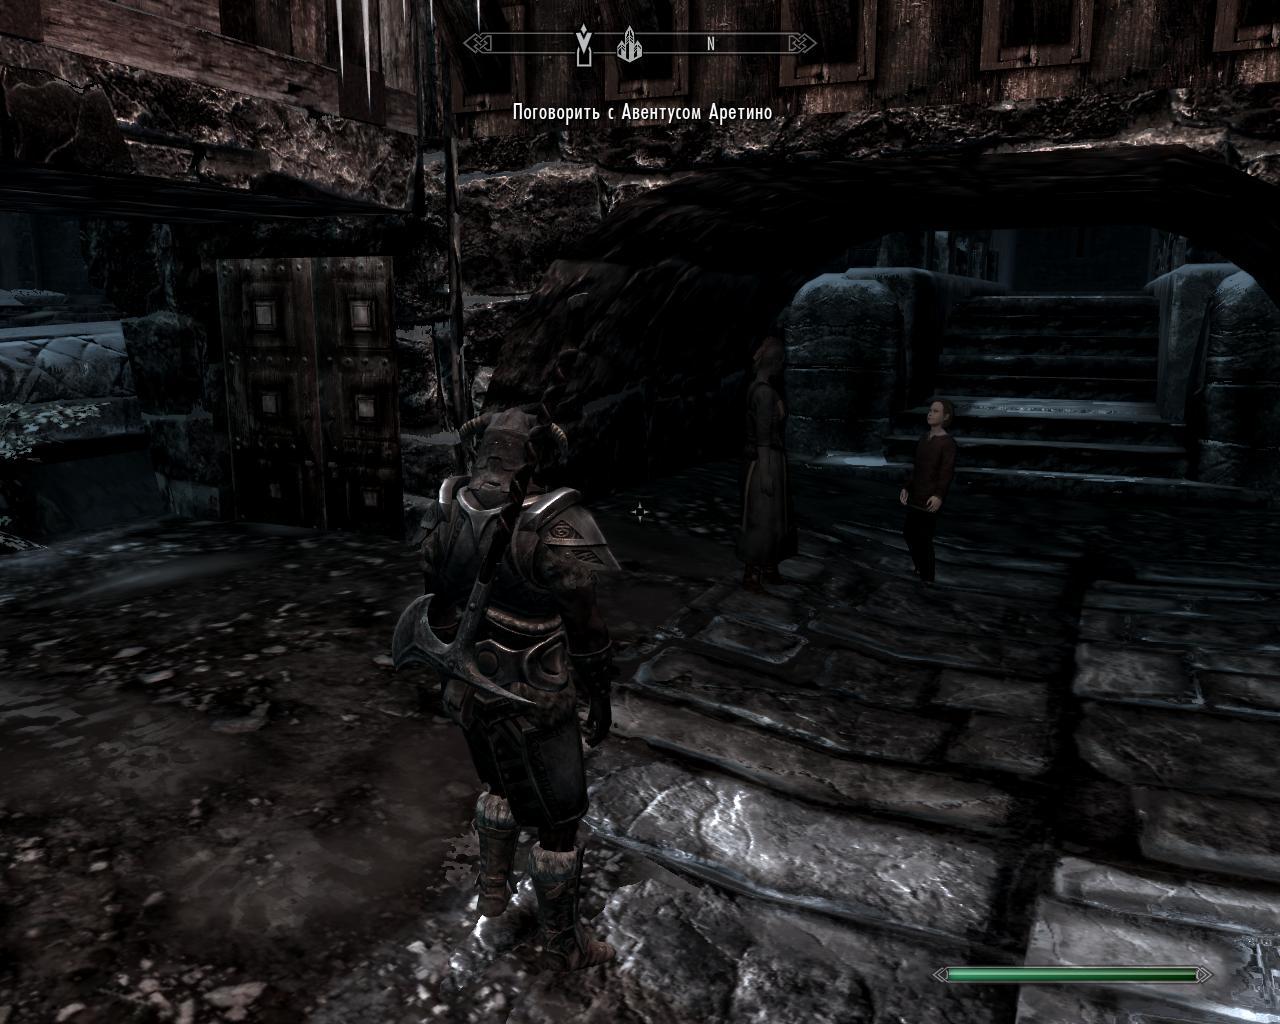 Скайрим на меня напал член темного братства